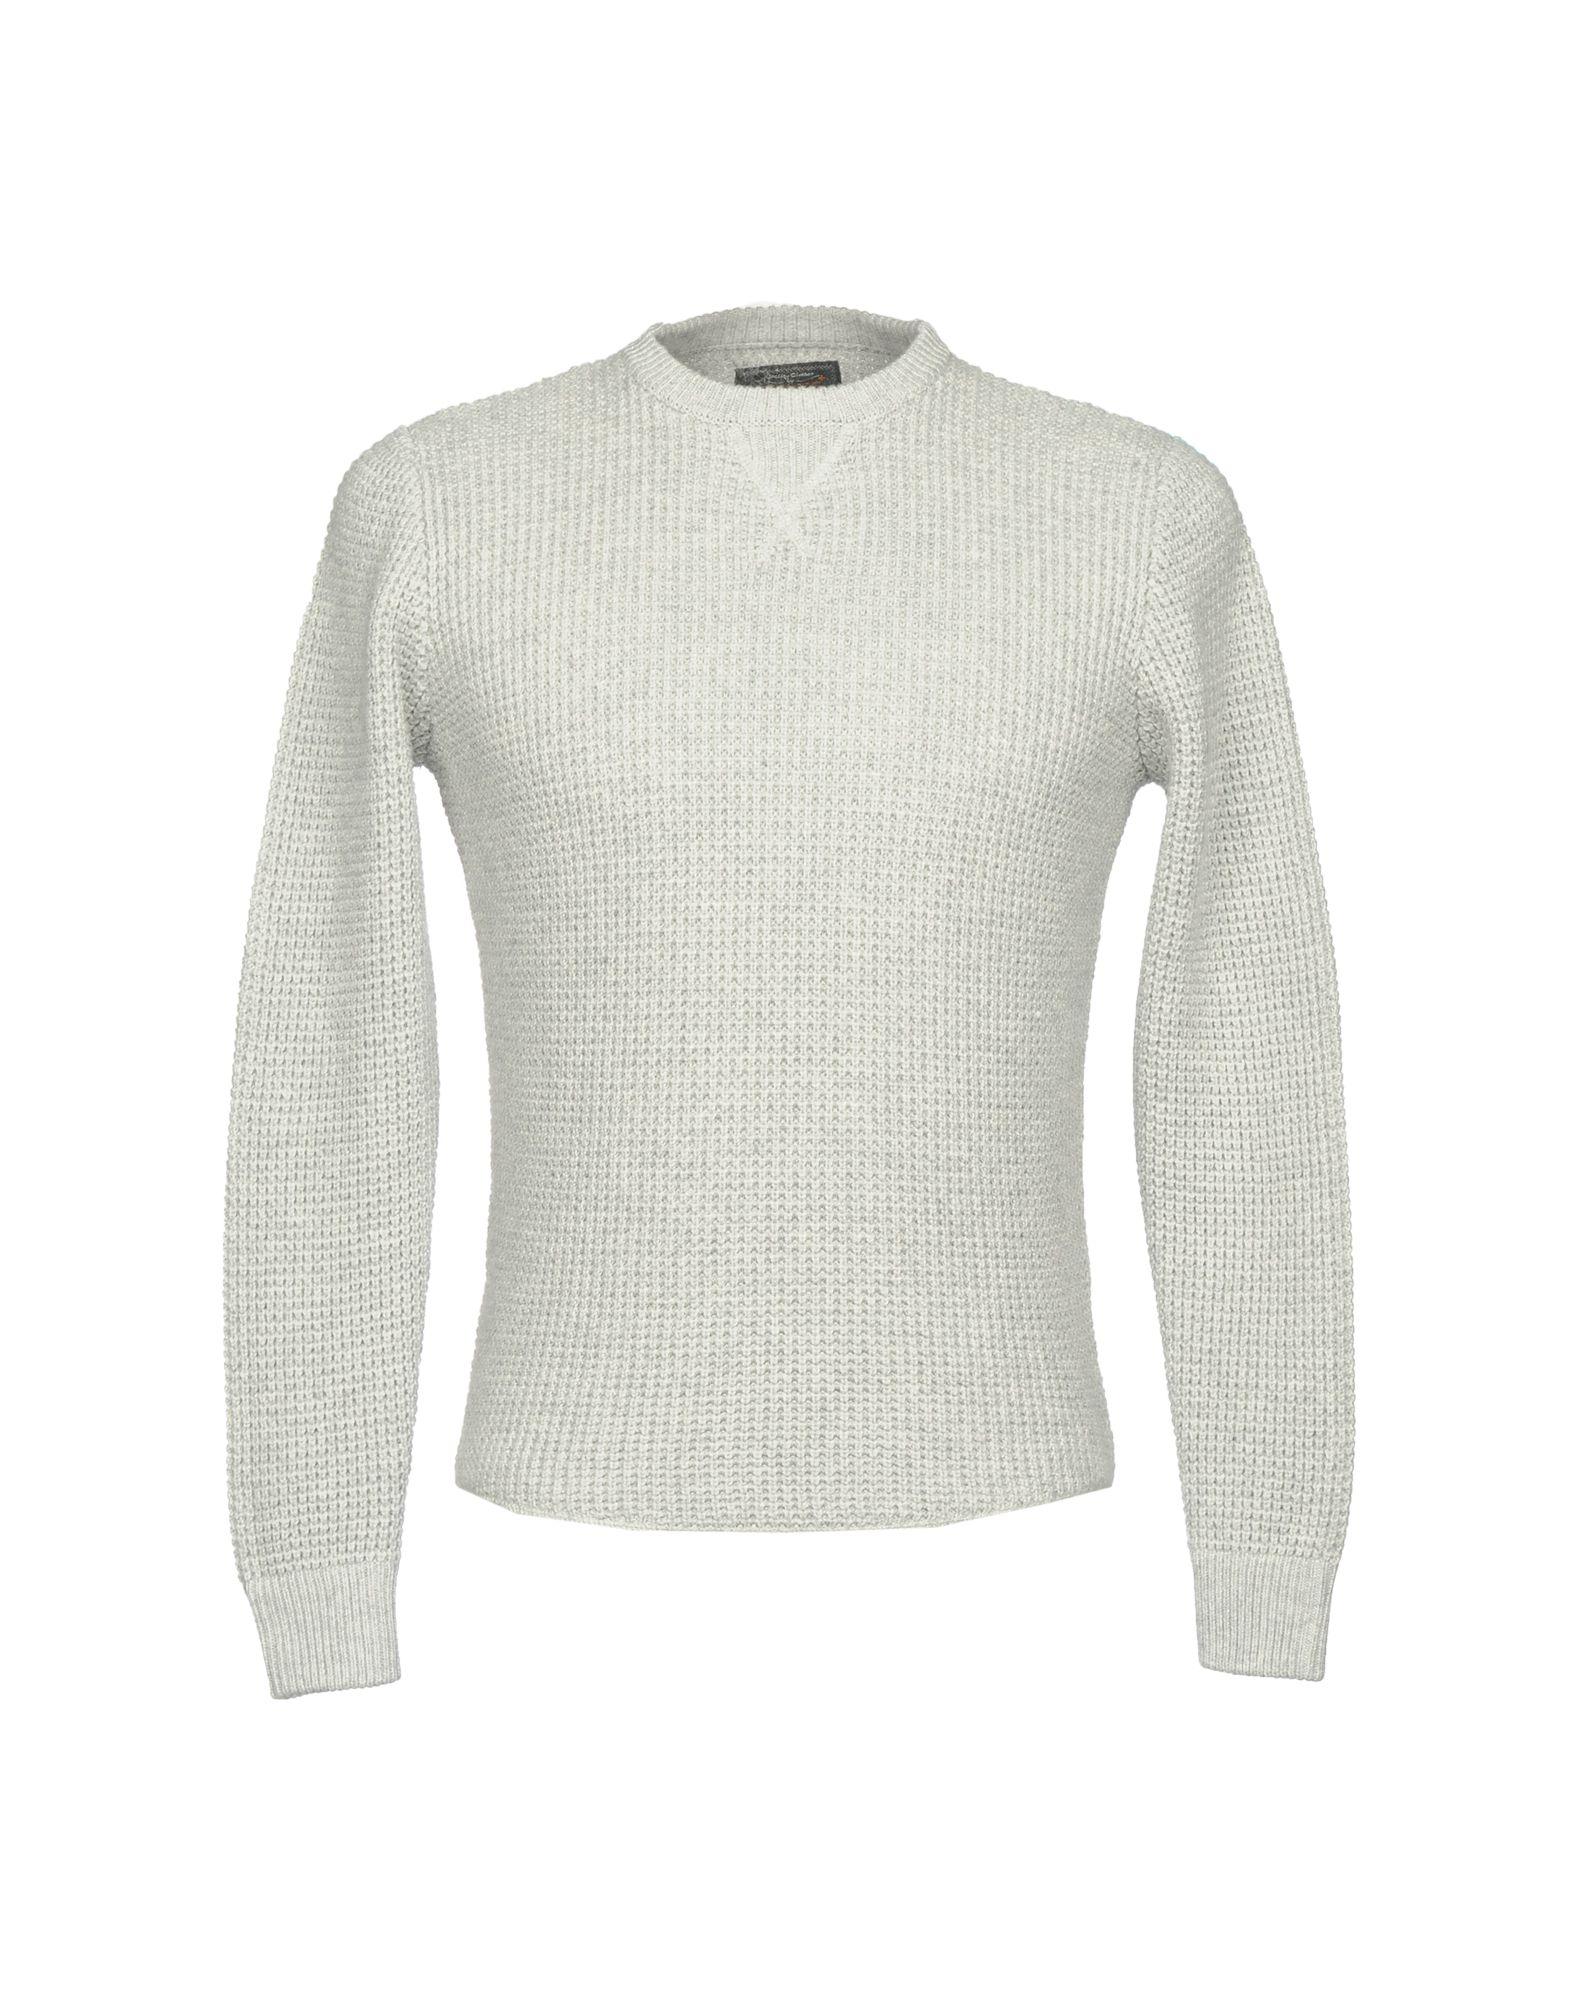 BEAMS Sweater in Grey